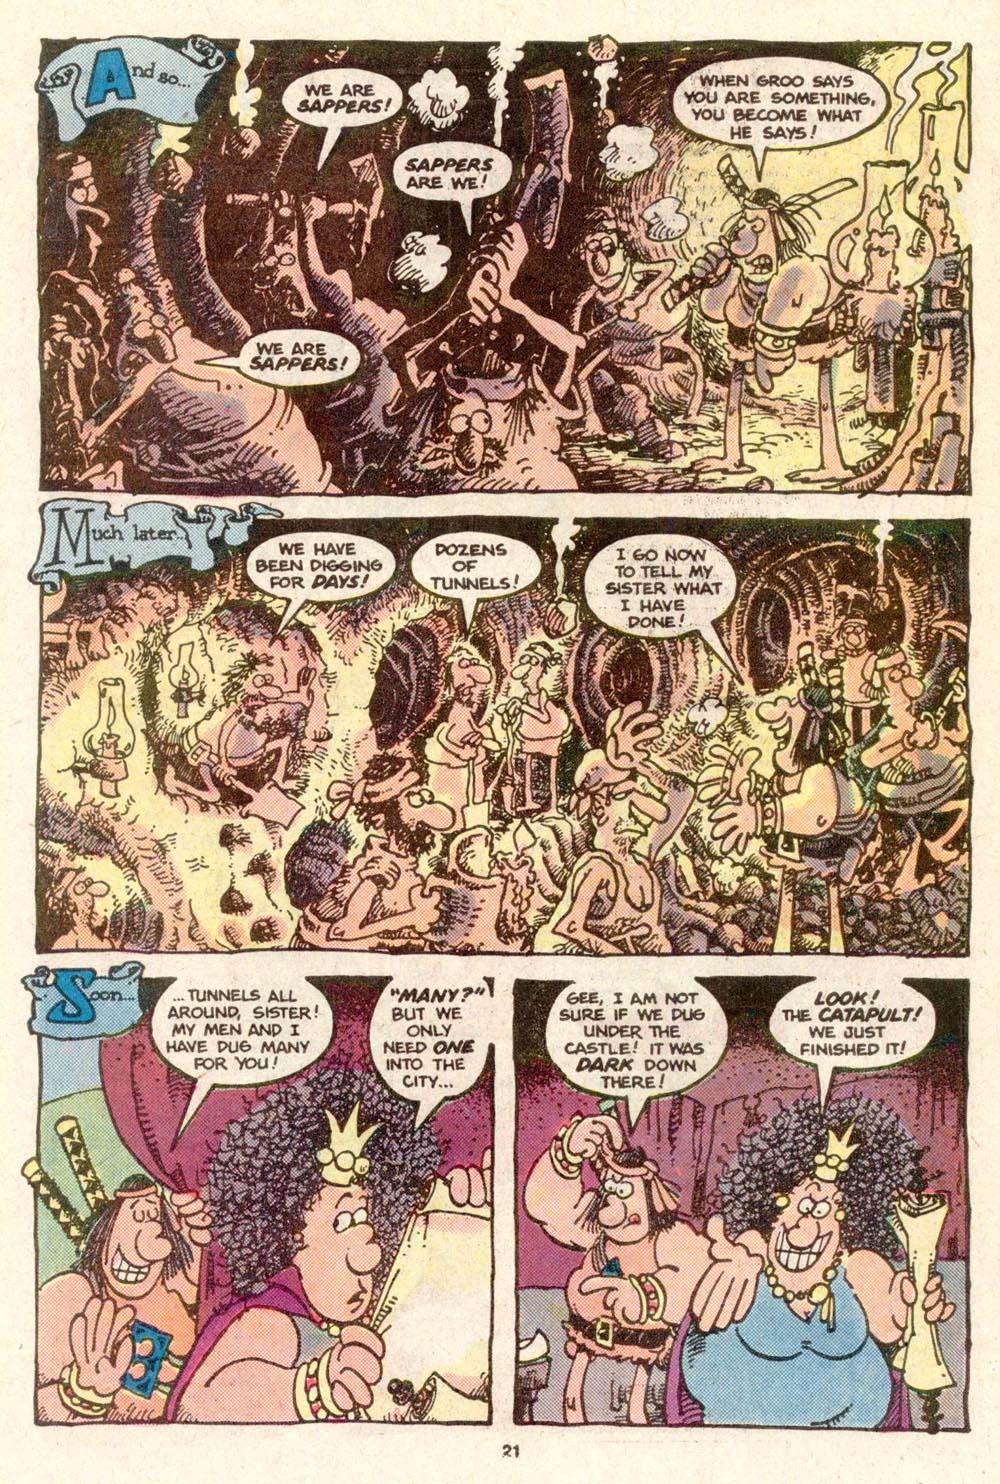 Read online Sergio Aragonés Groo the Wanderer comic -  Issue #19 - 22